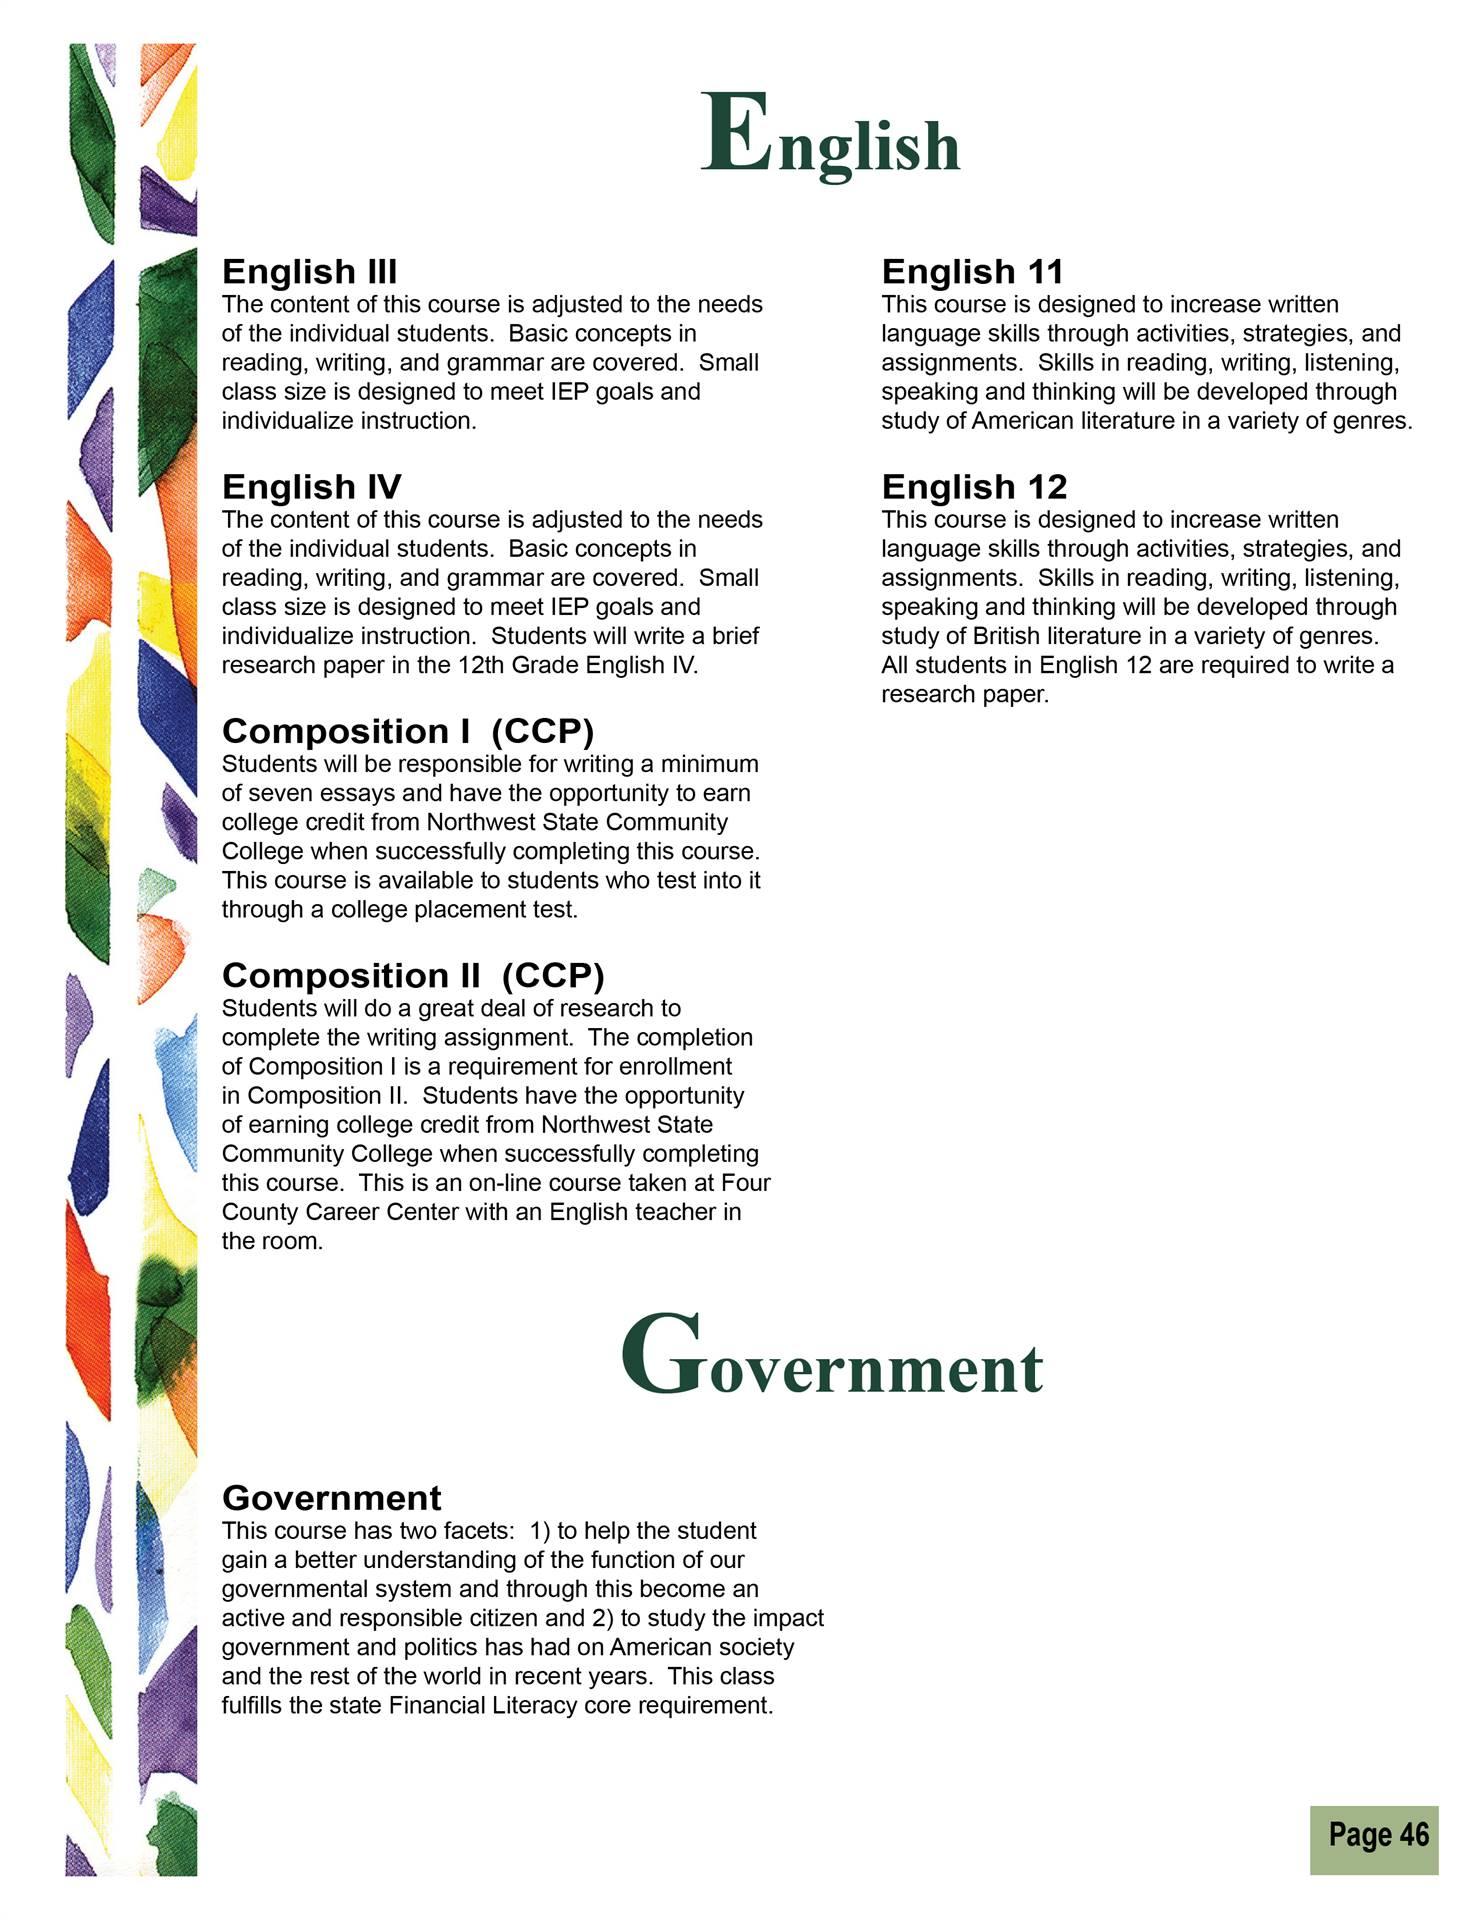 English & Government